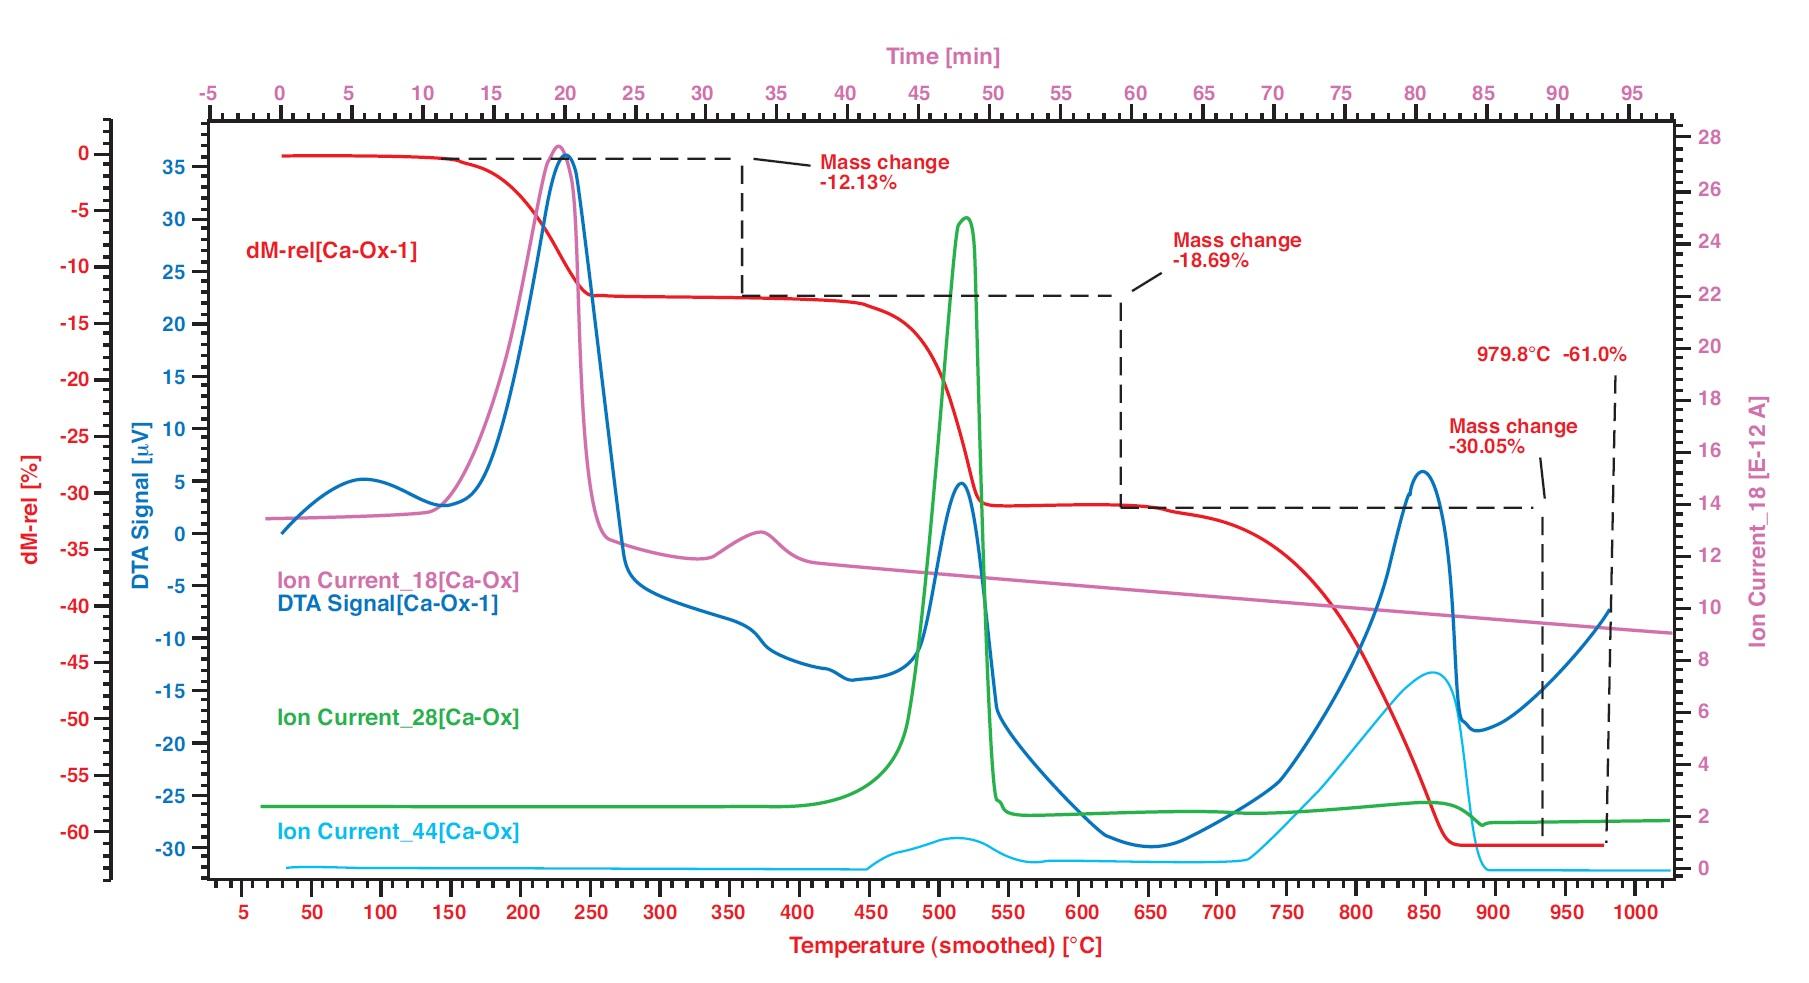 STa Applikation: Dekomposition von Calcium Oxalate Monohydrat CaC2O4 unter Argon-Atmosphäre